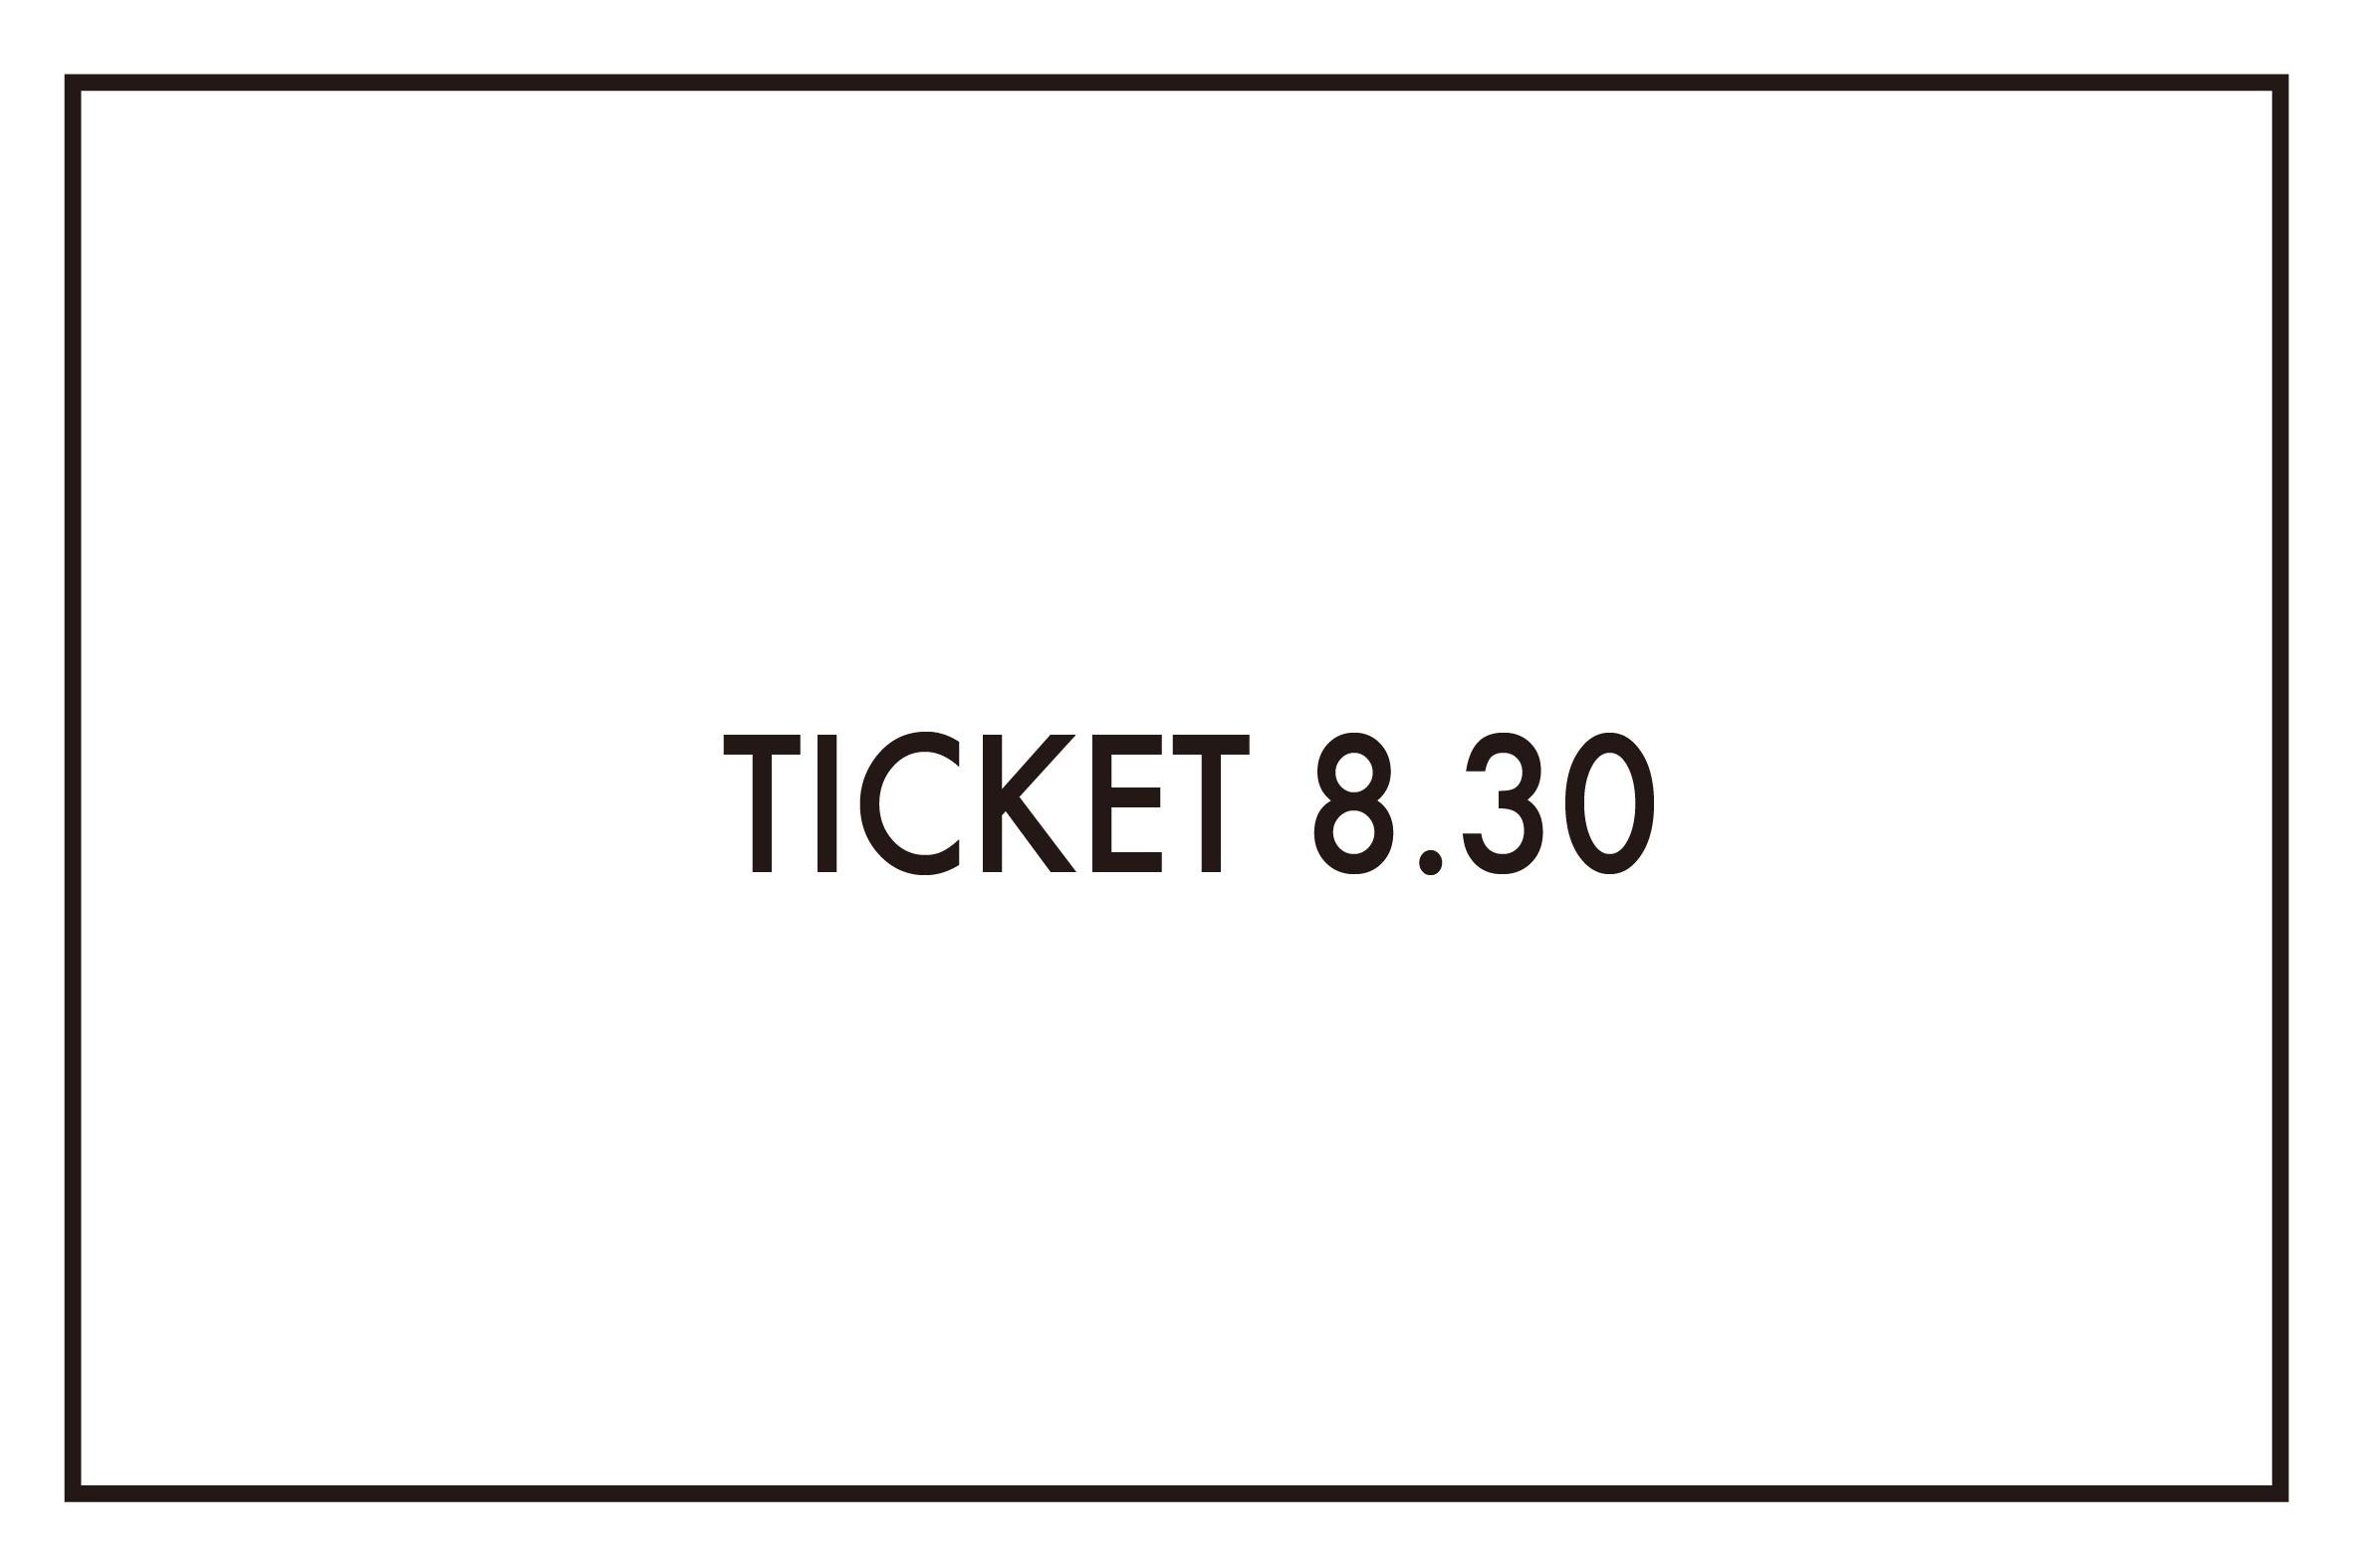 【A】優先入場チケットプラン